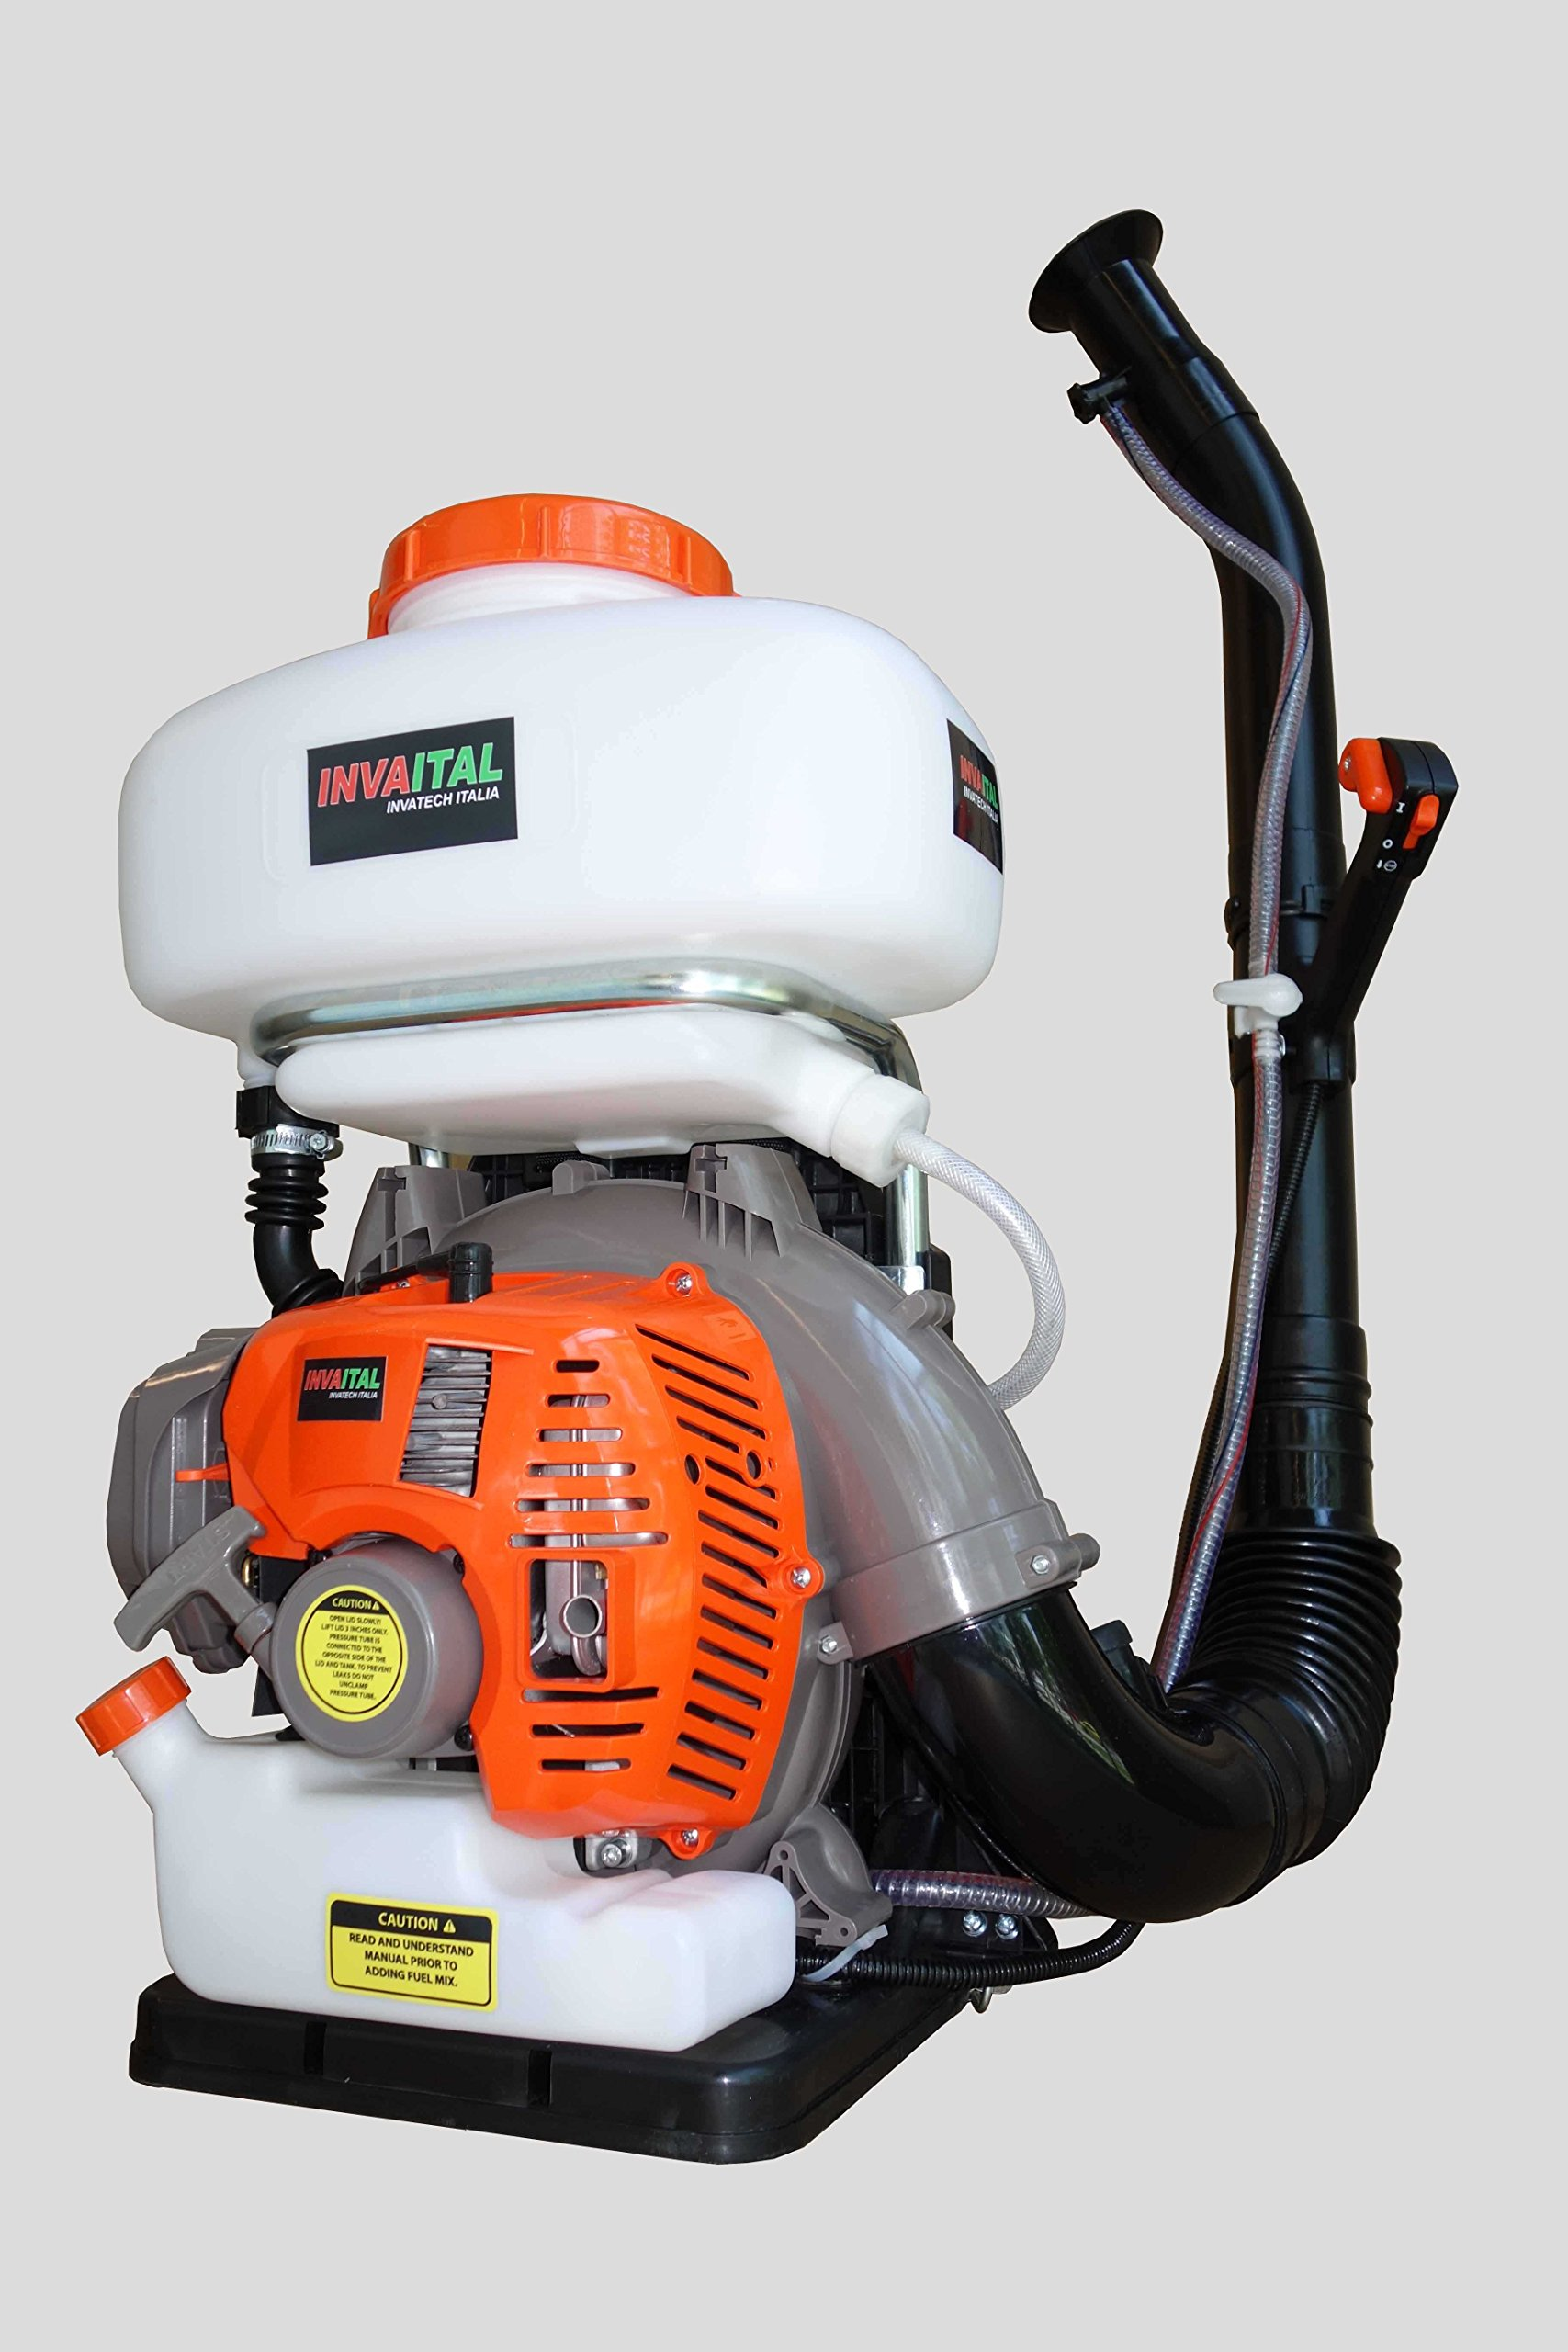 Invatech Italia New Model: 868 Mister Duster Mosquito Sprayer Mosquito Fogger Backpack Sprayer Cold Fogger by Invatech Italia